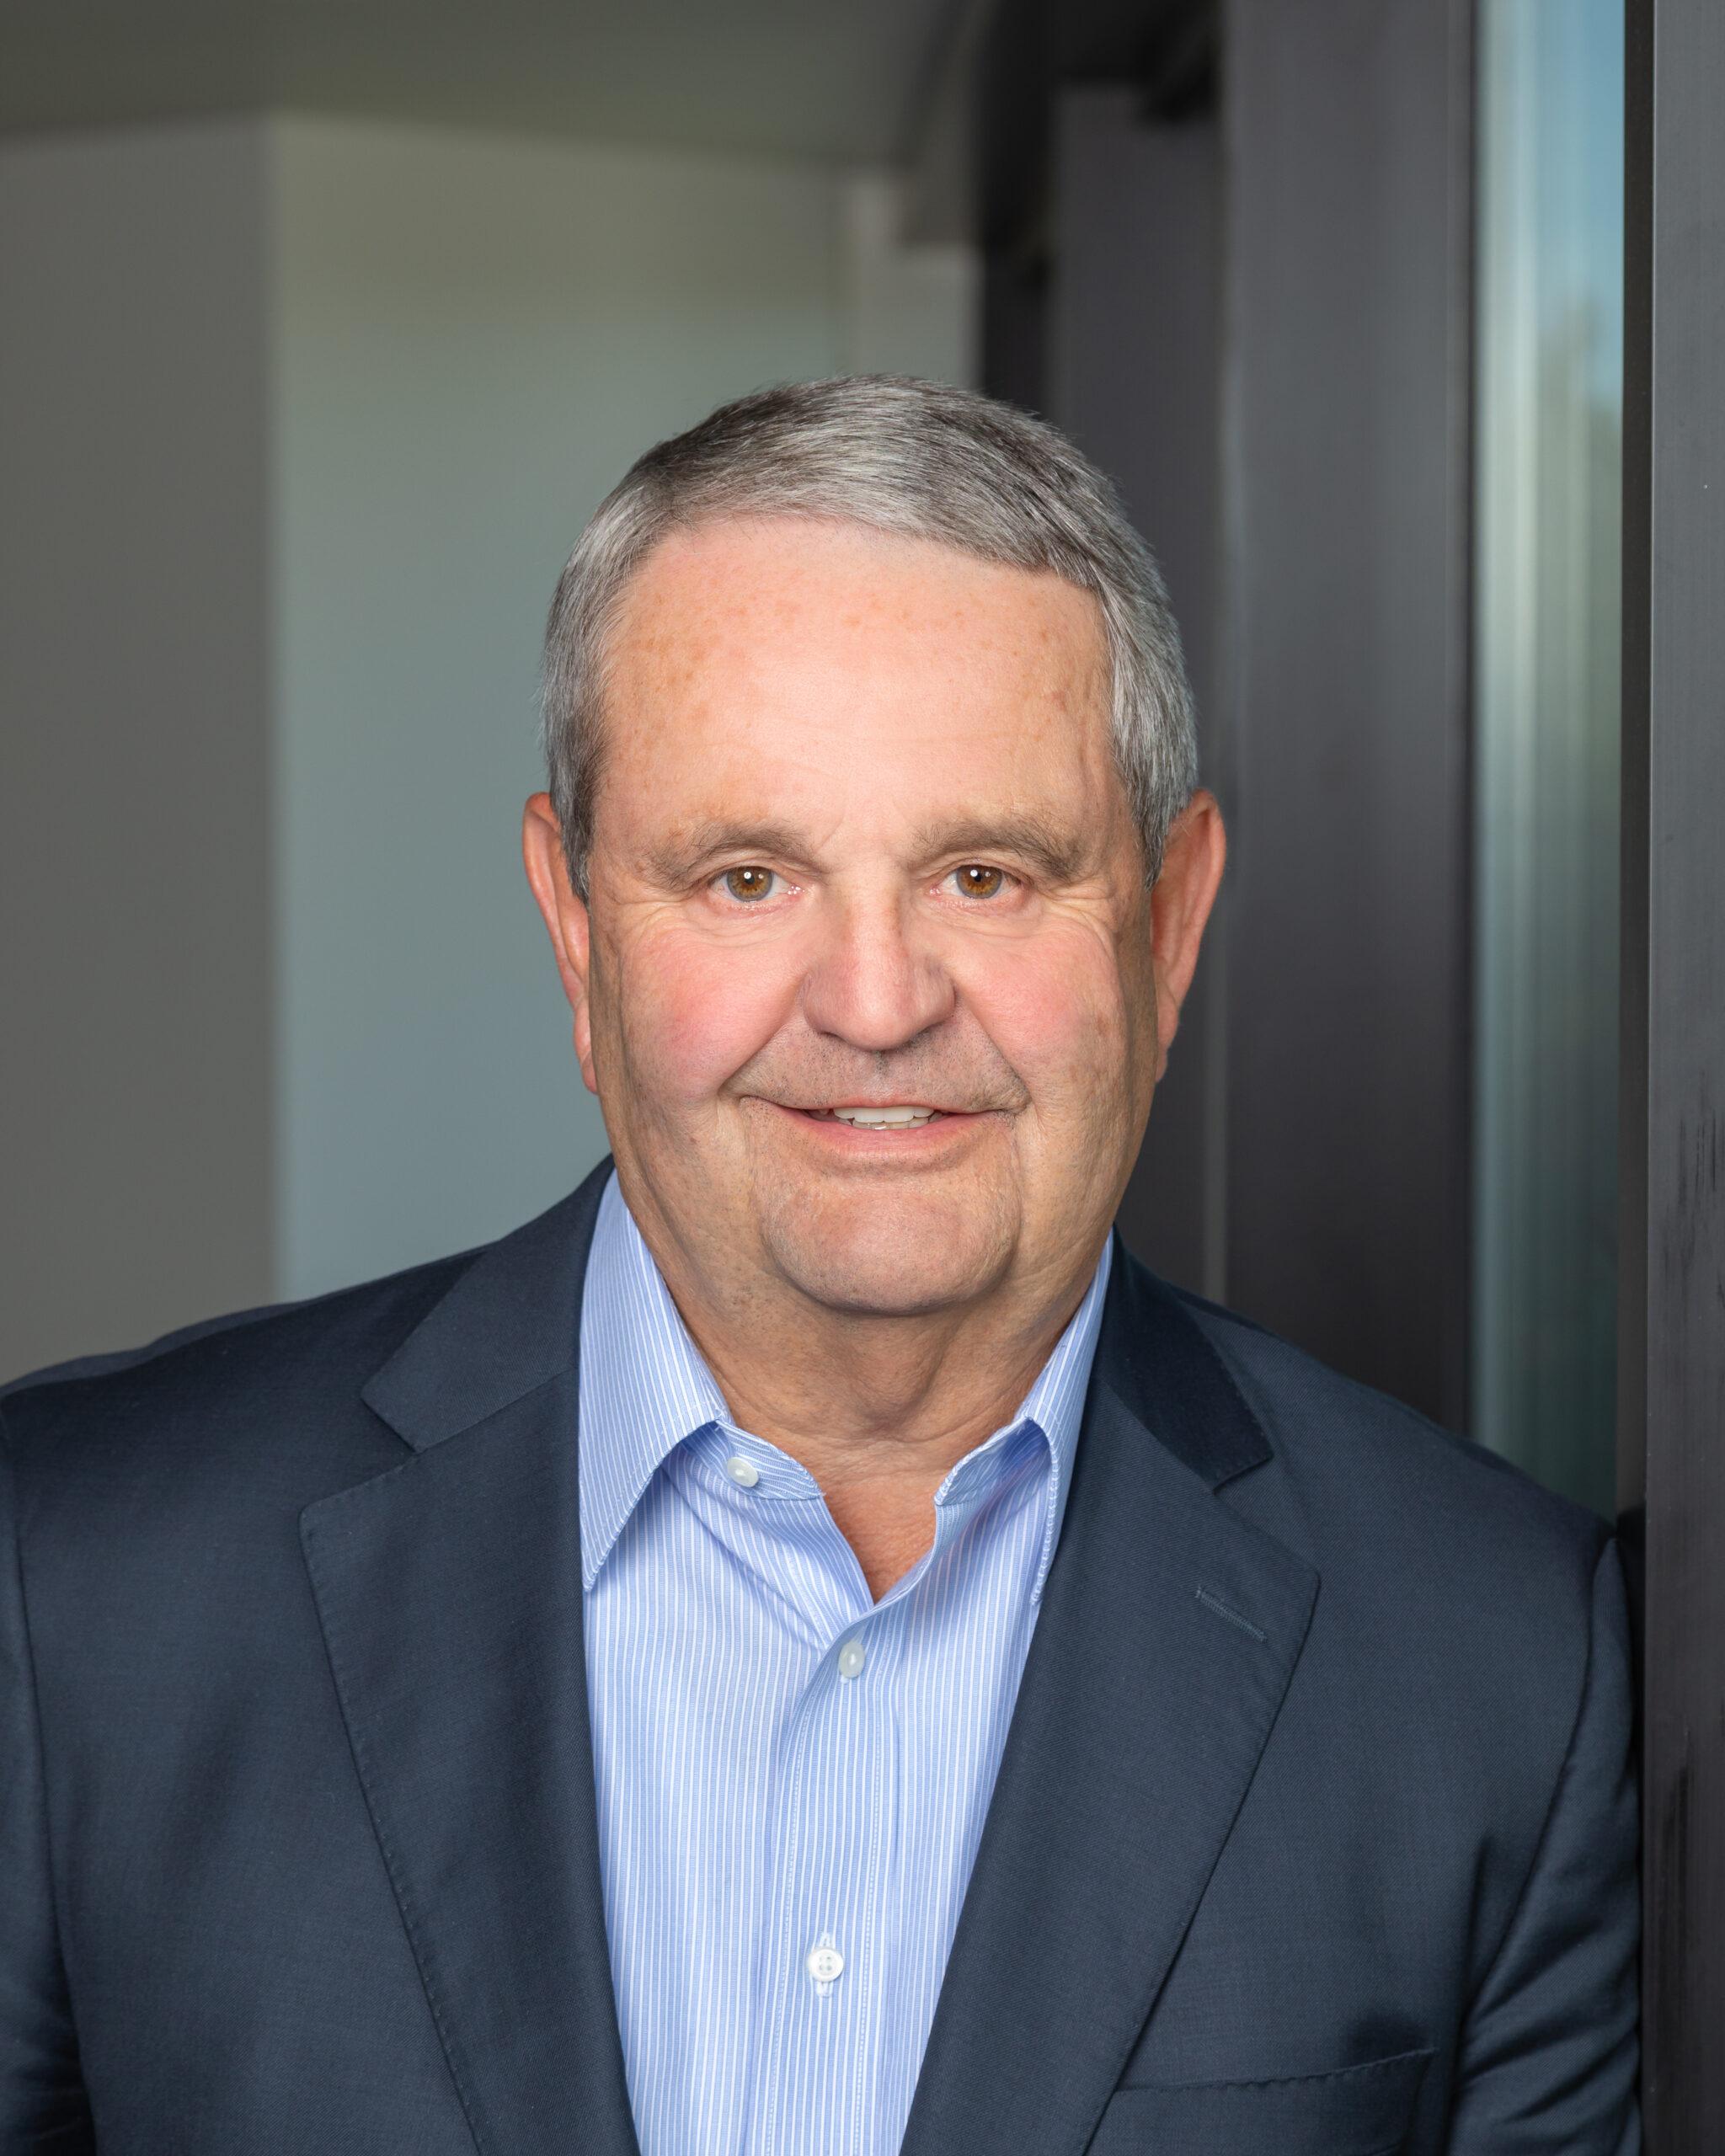 Michael Vanderslice - investment bank, m&a advisor, Seattle